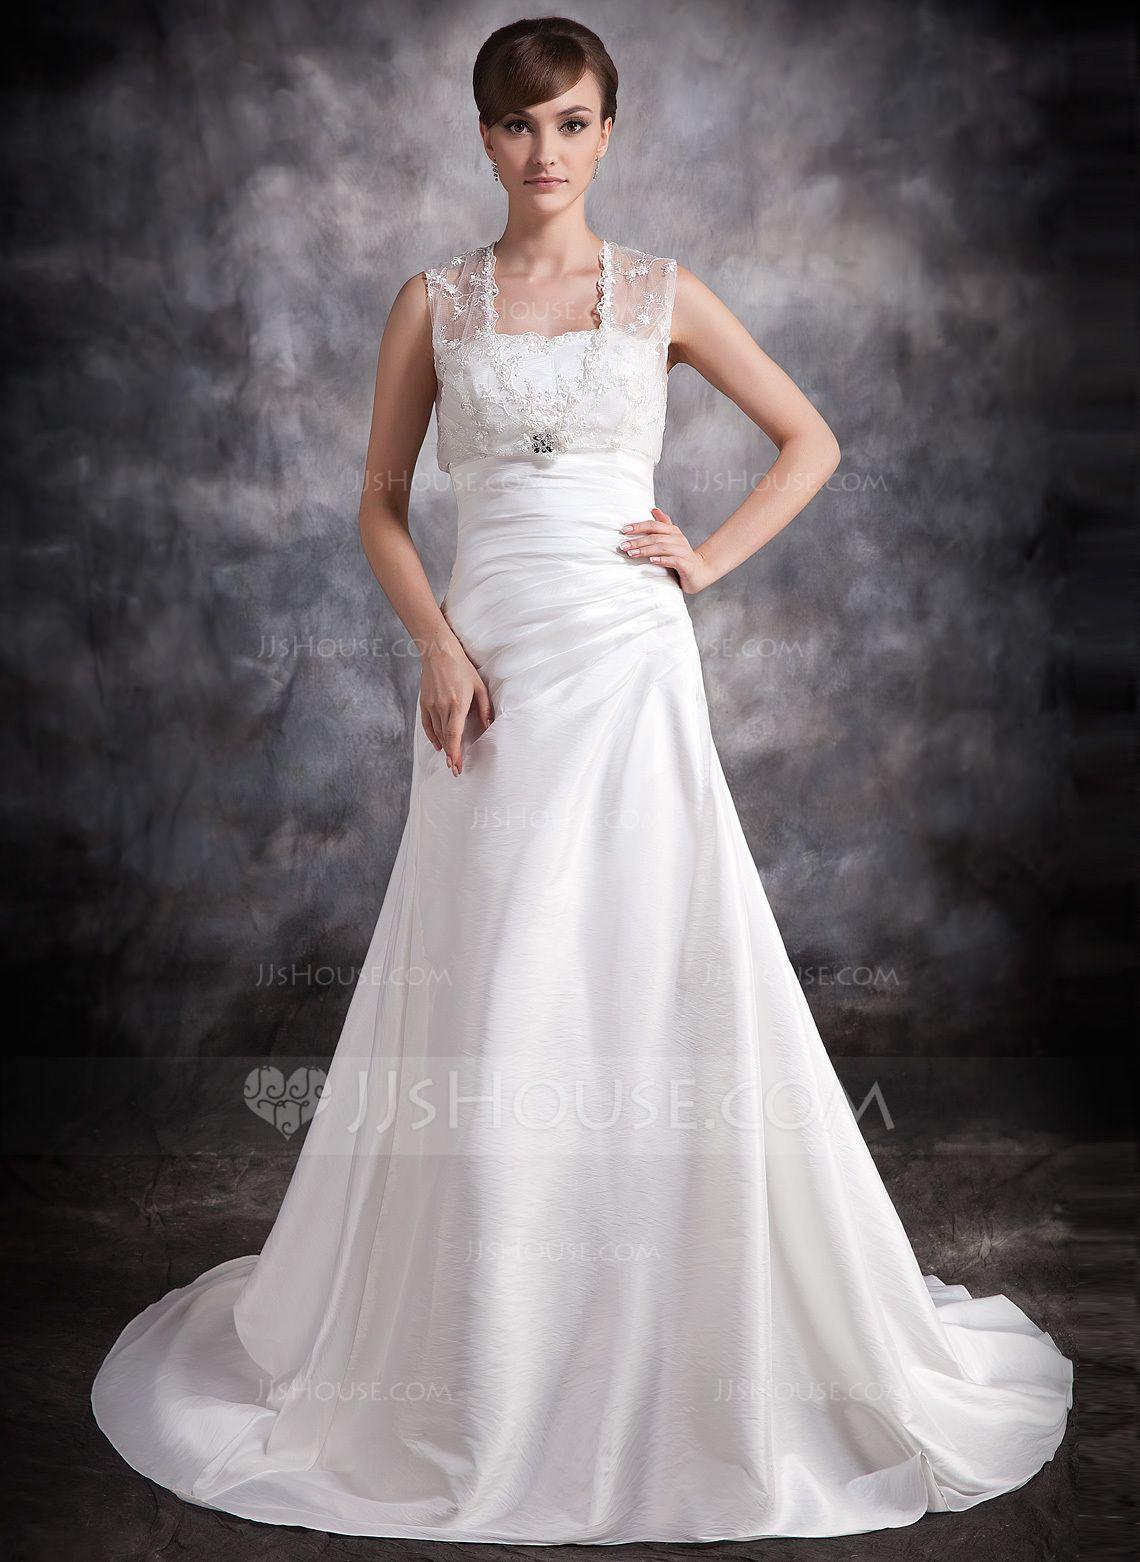 Alineprincess sweetheart court train taffeta wedding dress with